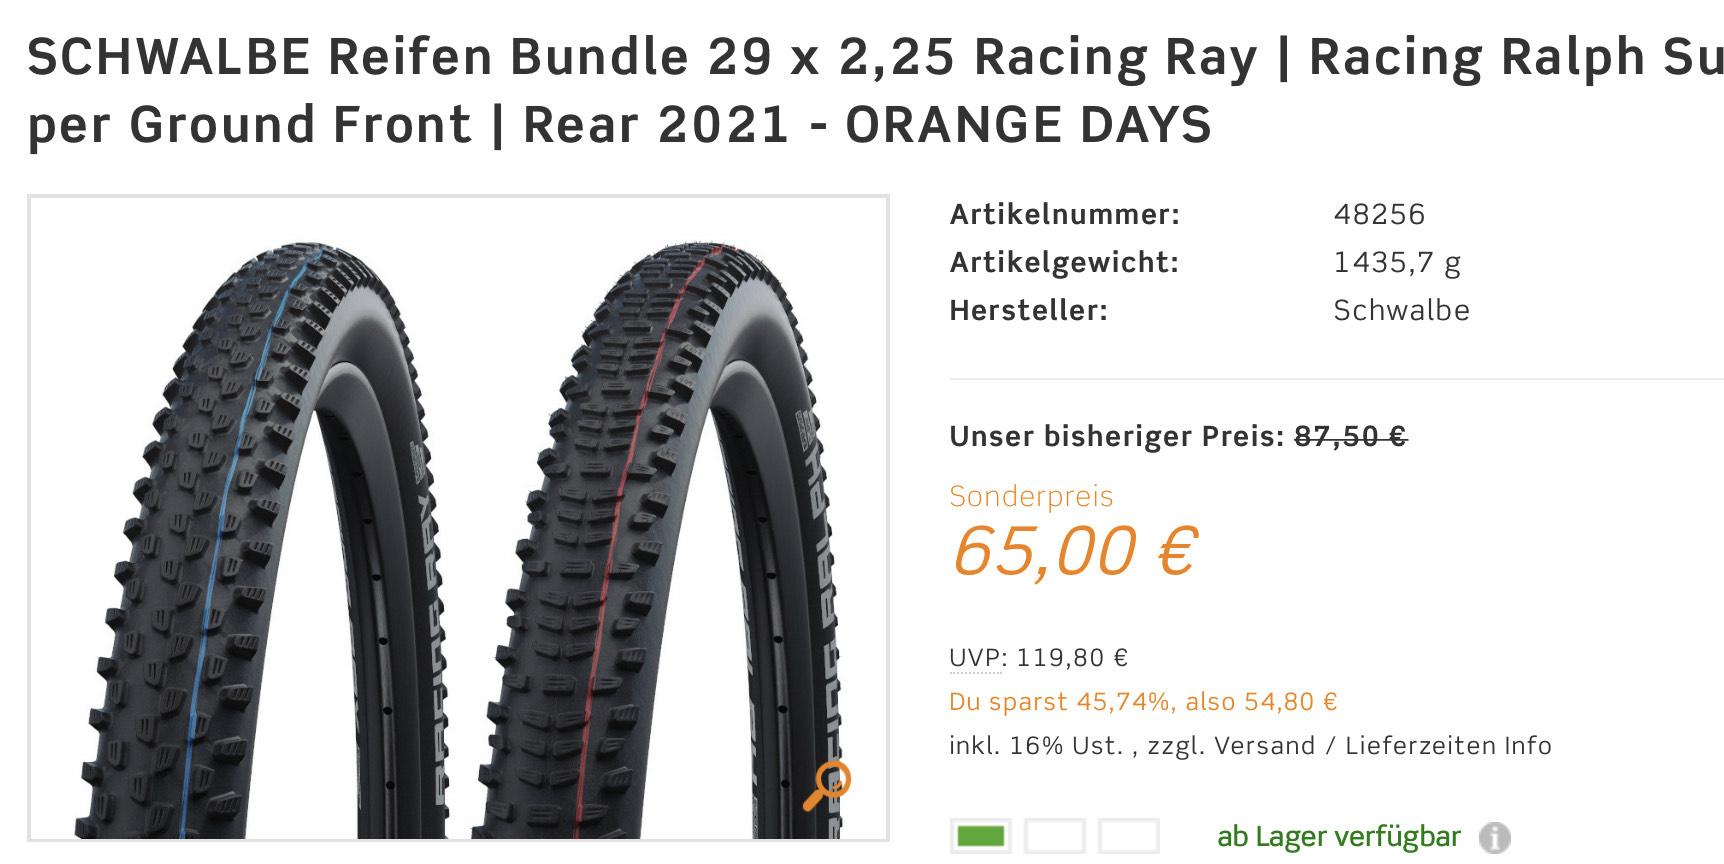 SCHWALBE Reifen Bundle 29 x 2,25 Racing Ray   Racing Ralph Super Ground Front   Rear 2021 - ORANGE DAYS